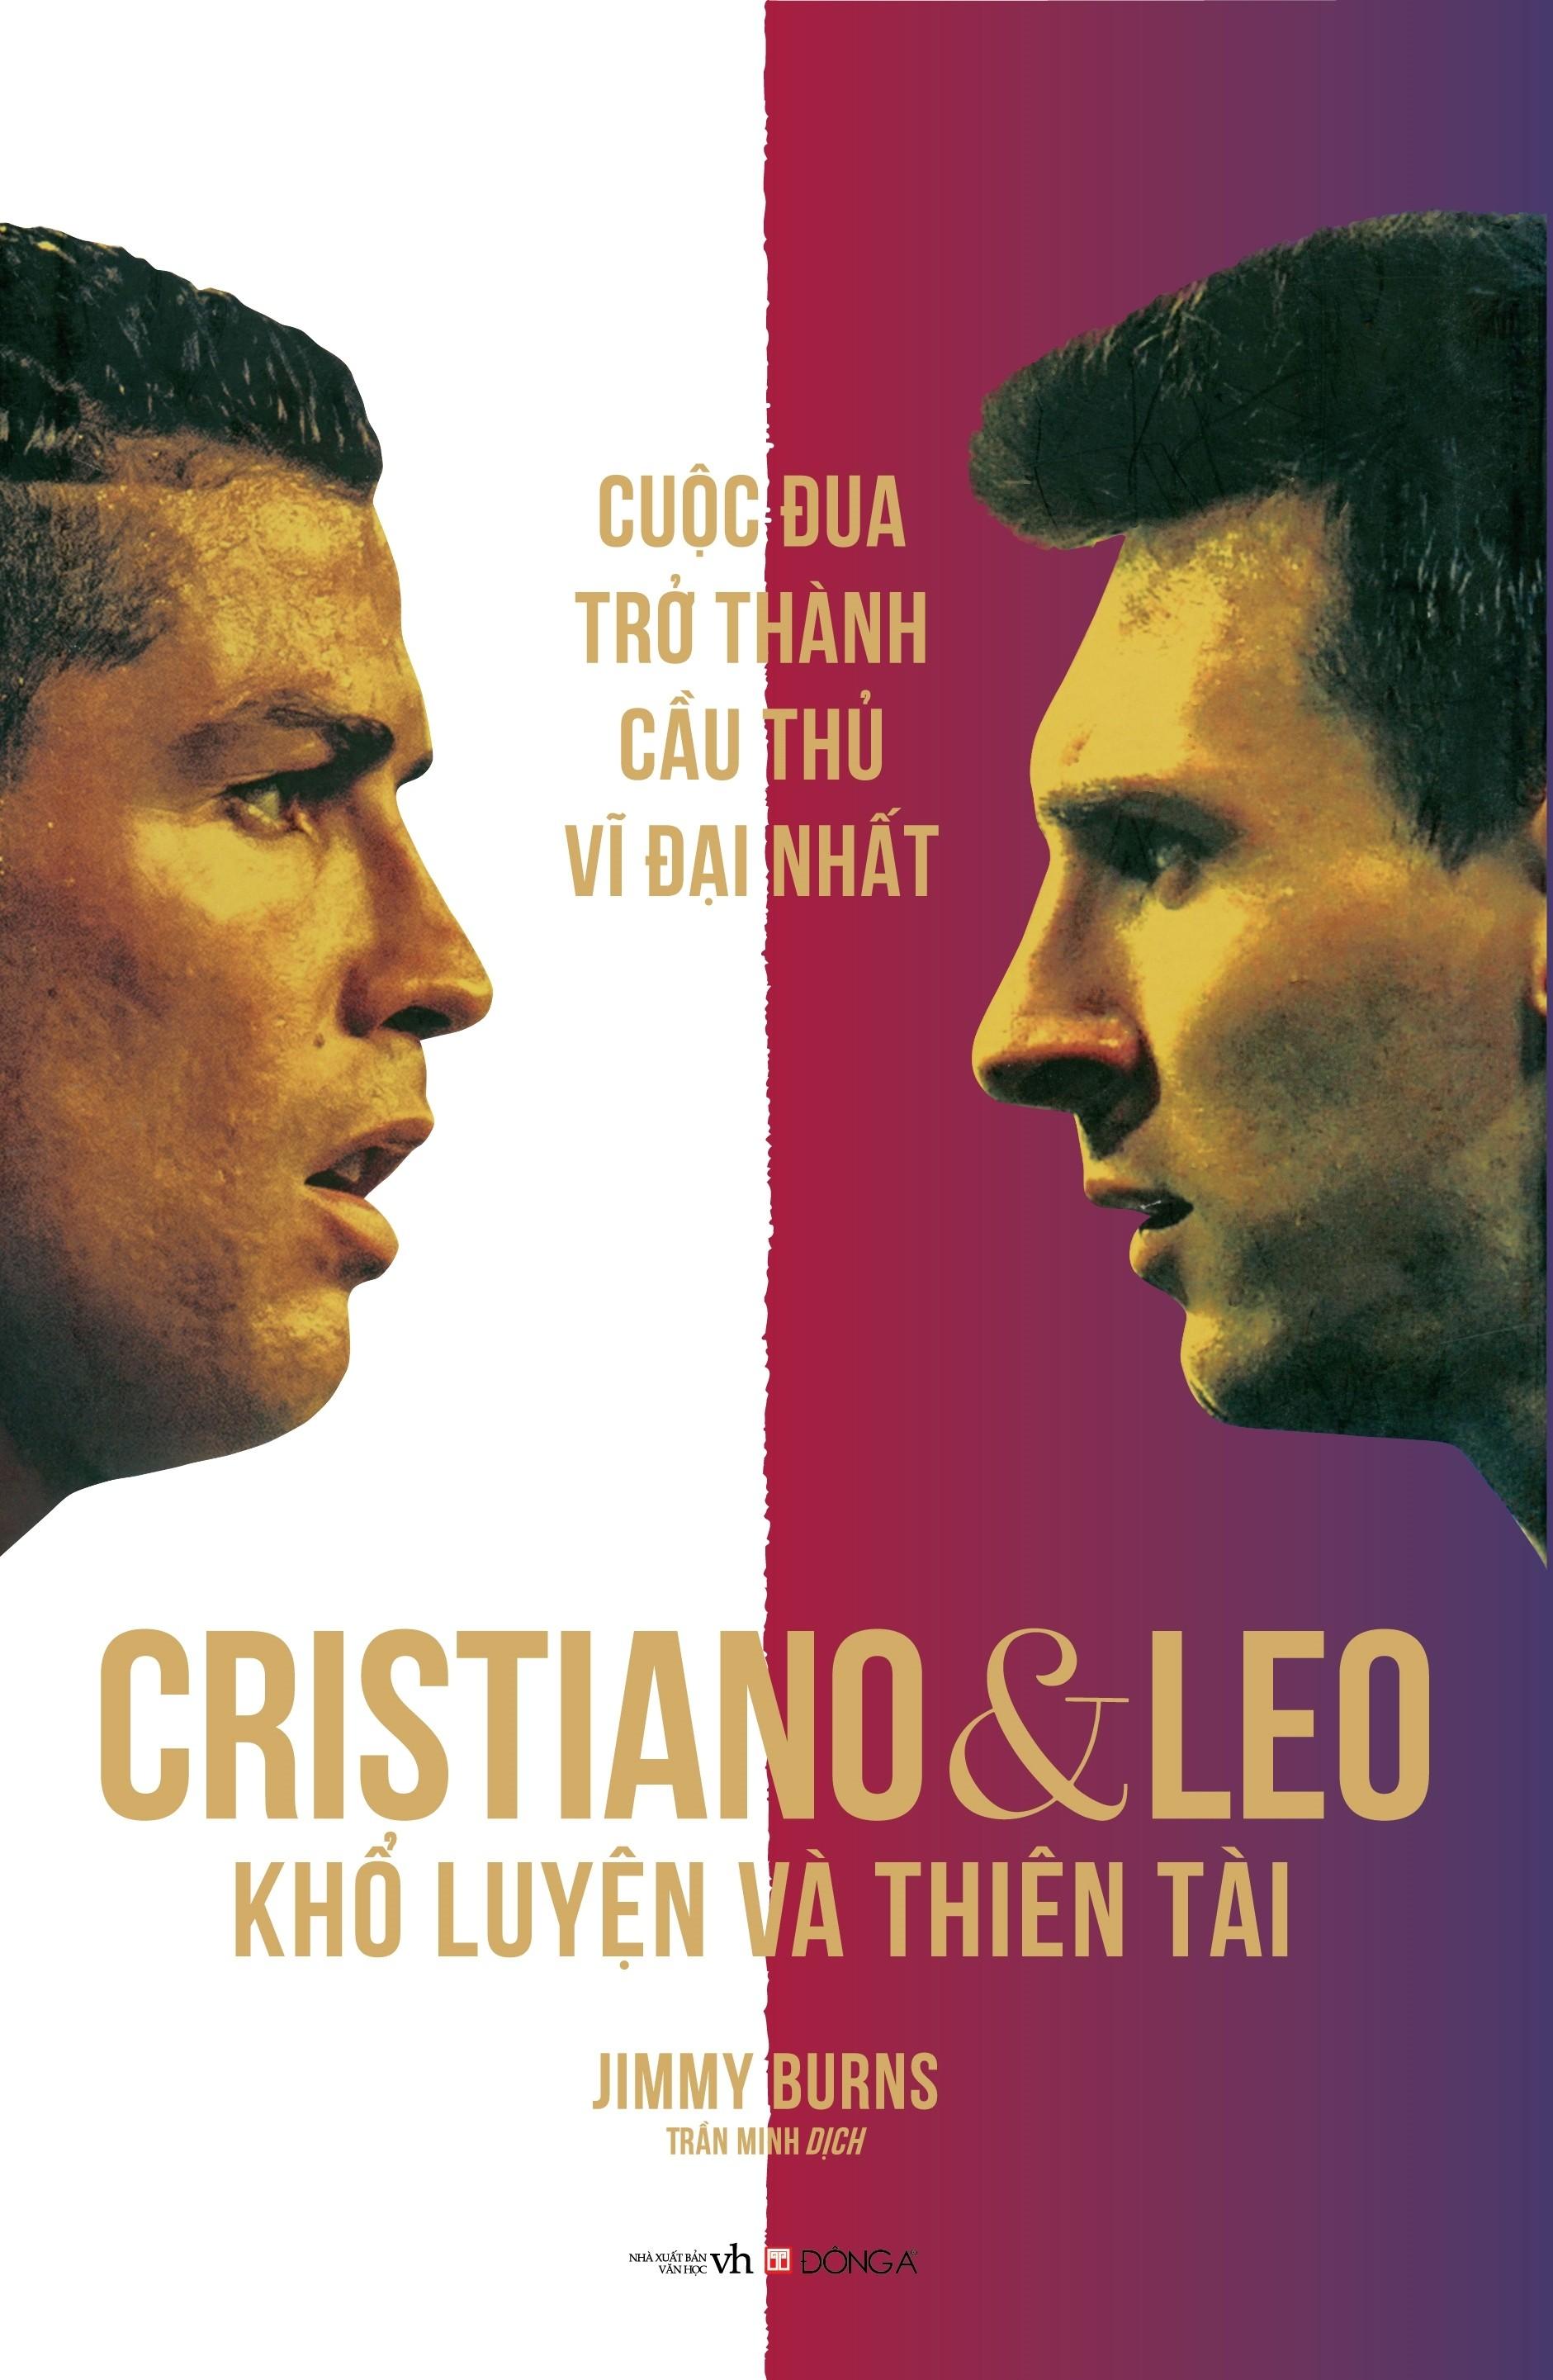 cristiano ronaldo & lionel messi - kho luyen va thien tai - elle man